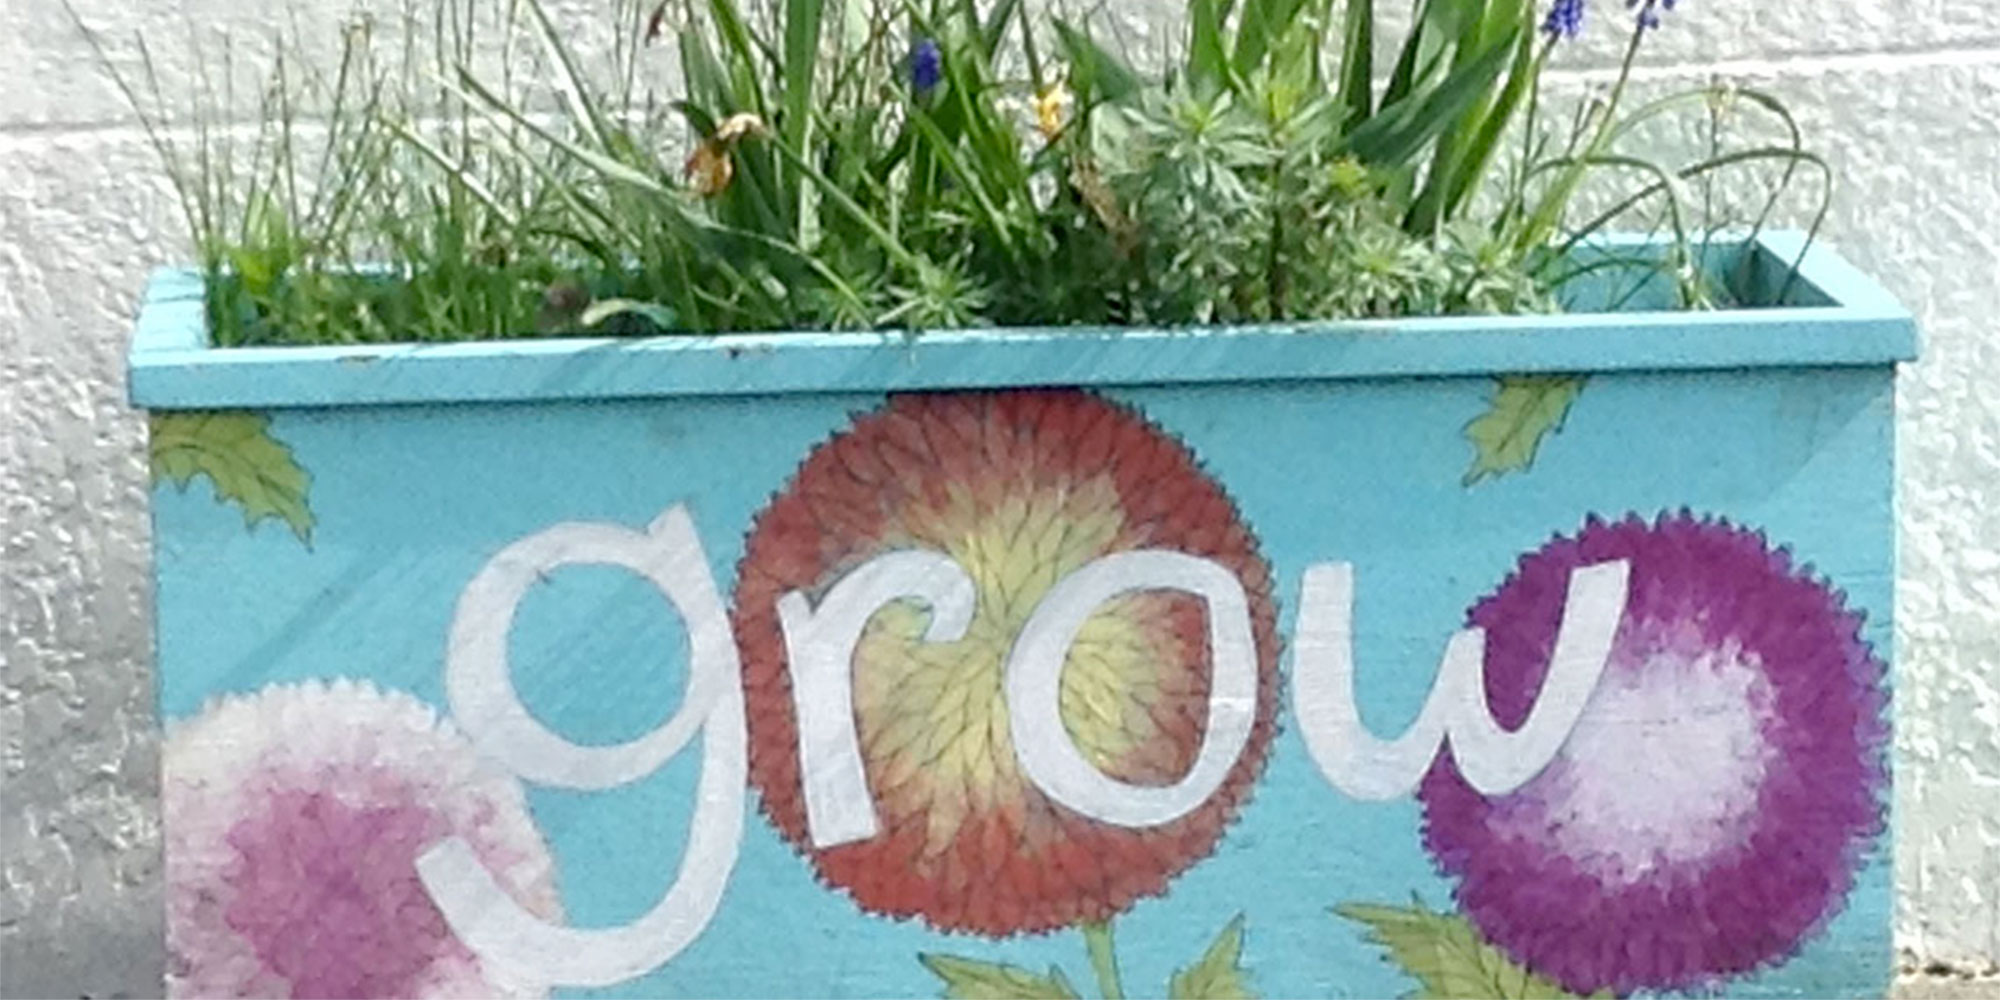 No Matter What, Keep Growing